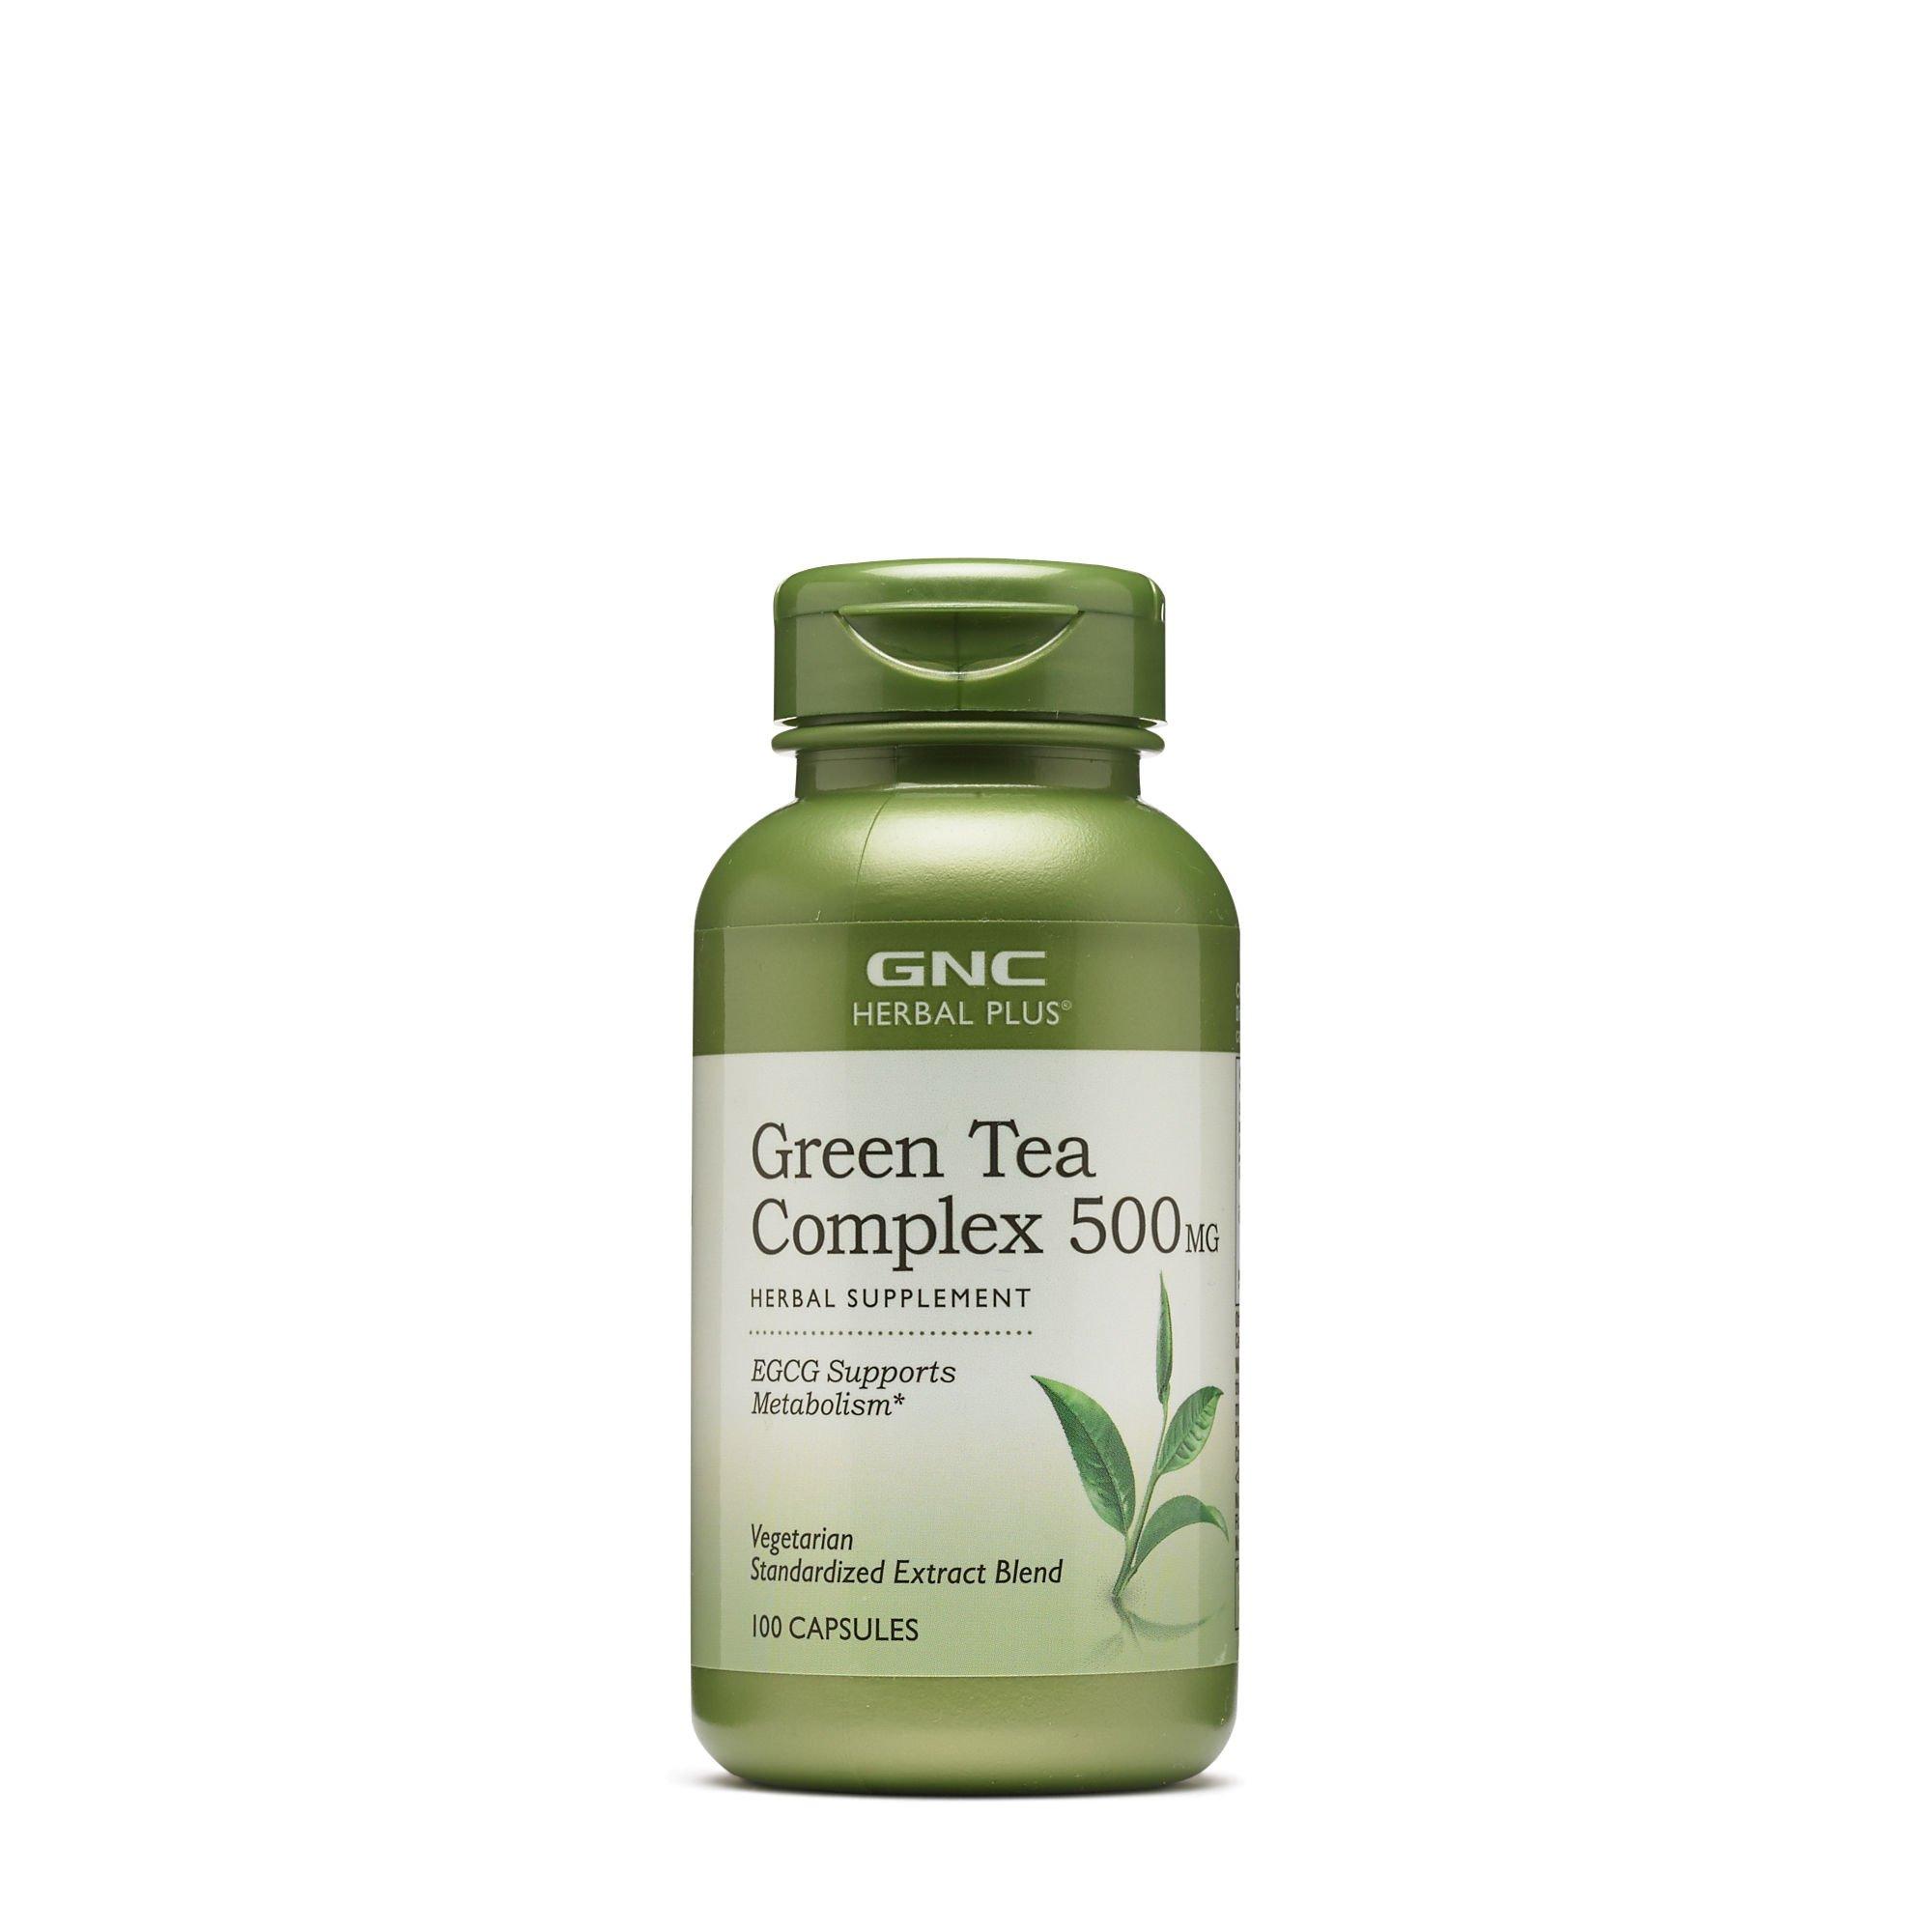 GNC Herbal Plus Green Tea Complex 500 mg 100 caps